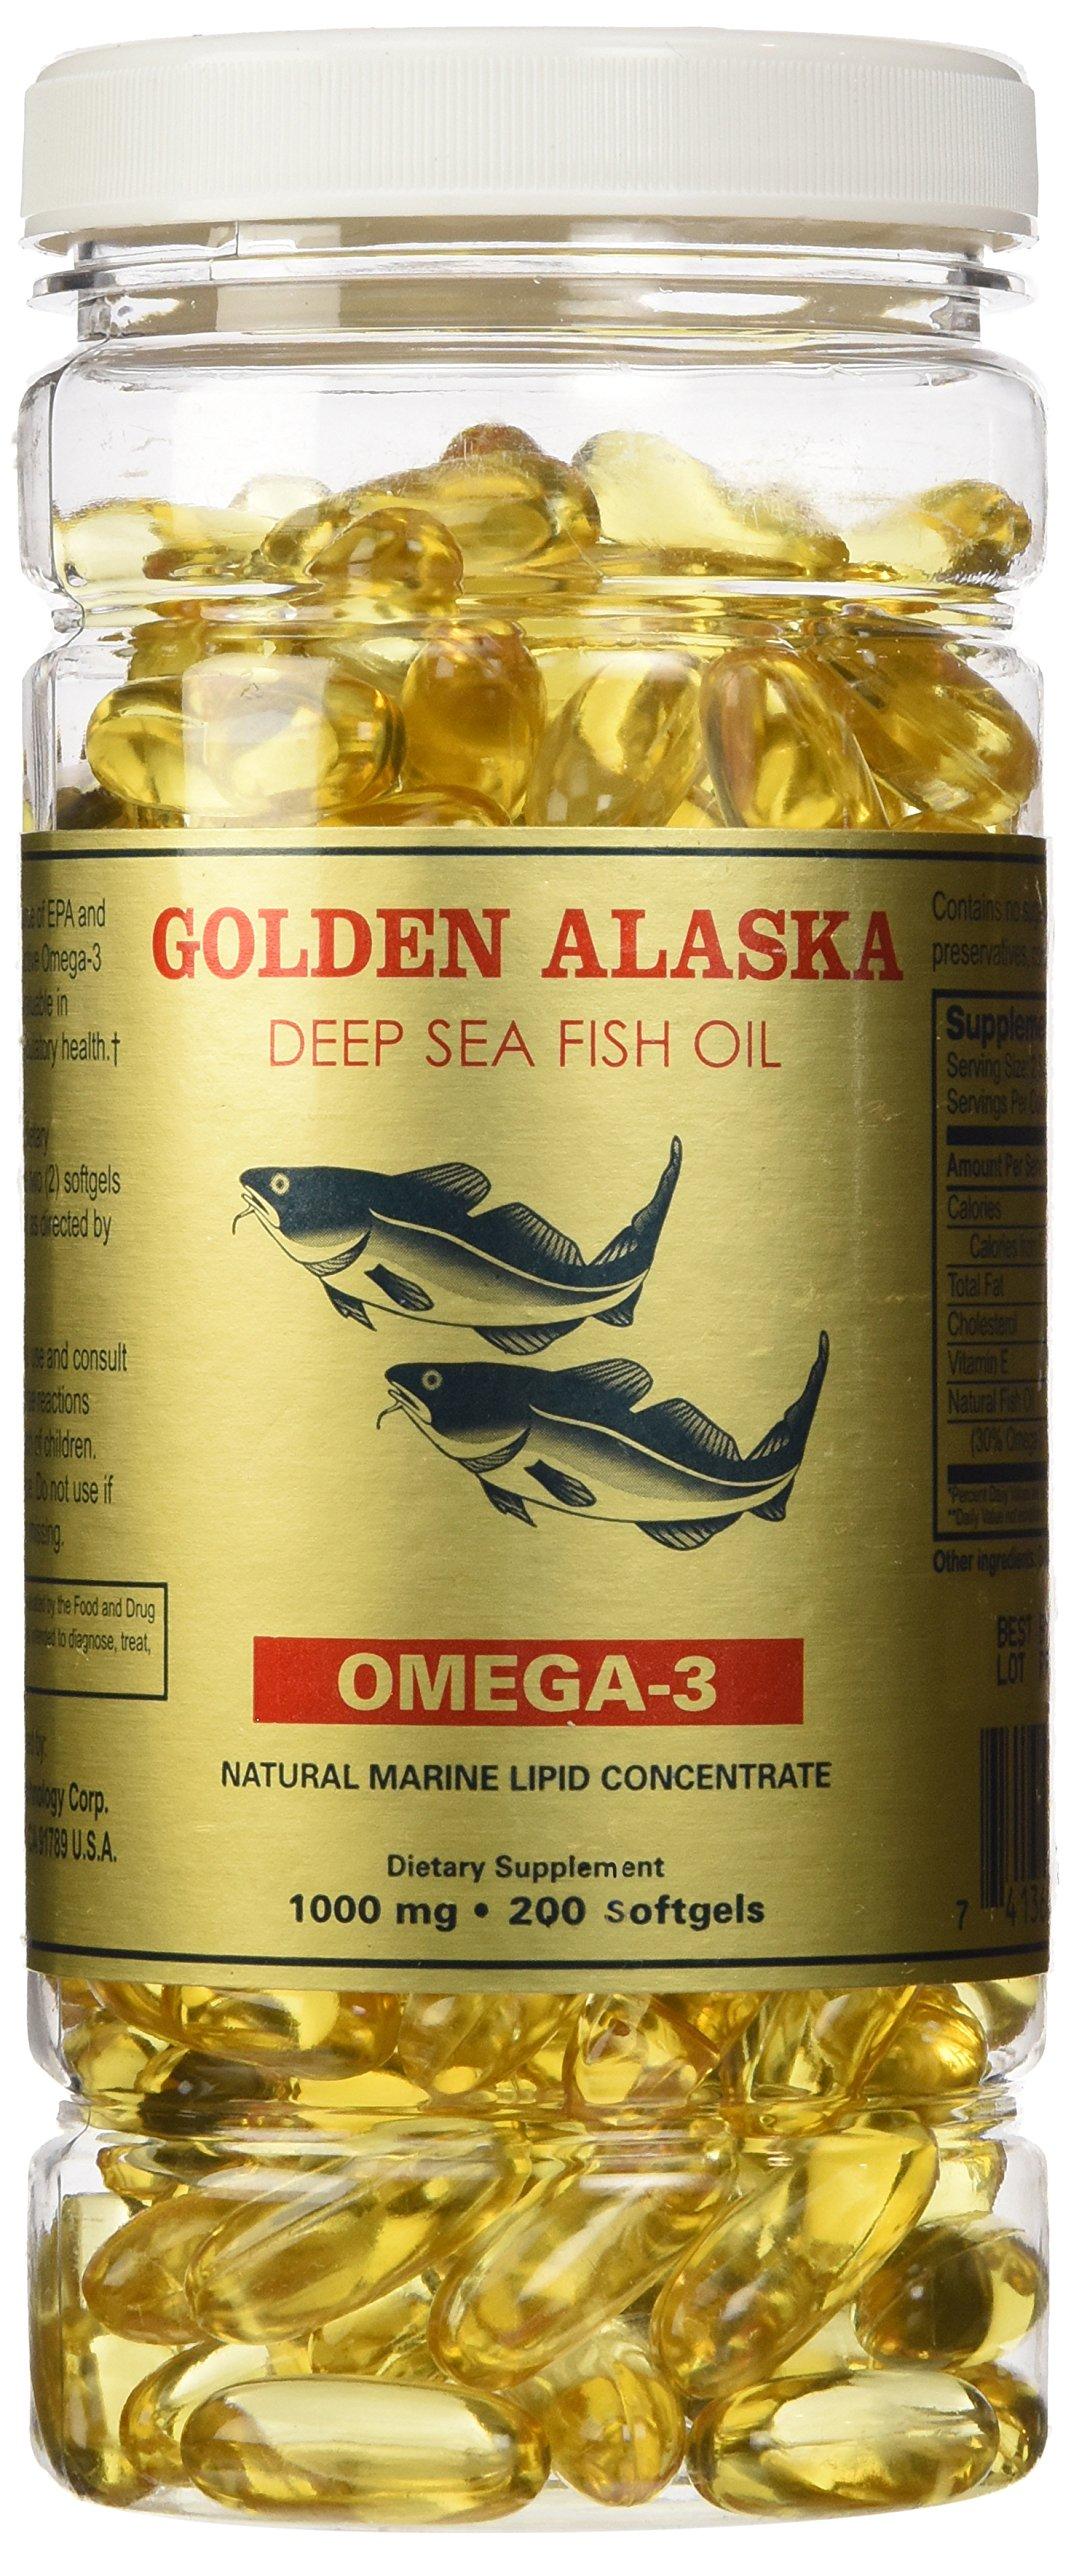 Alaska deep sea